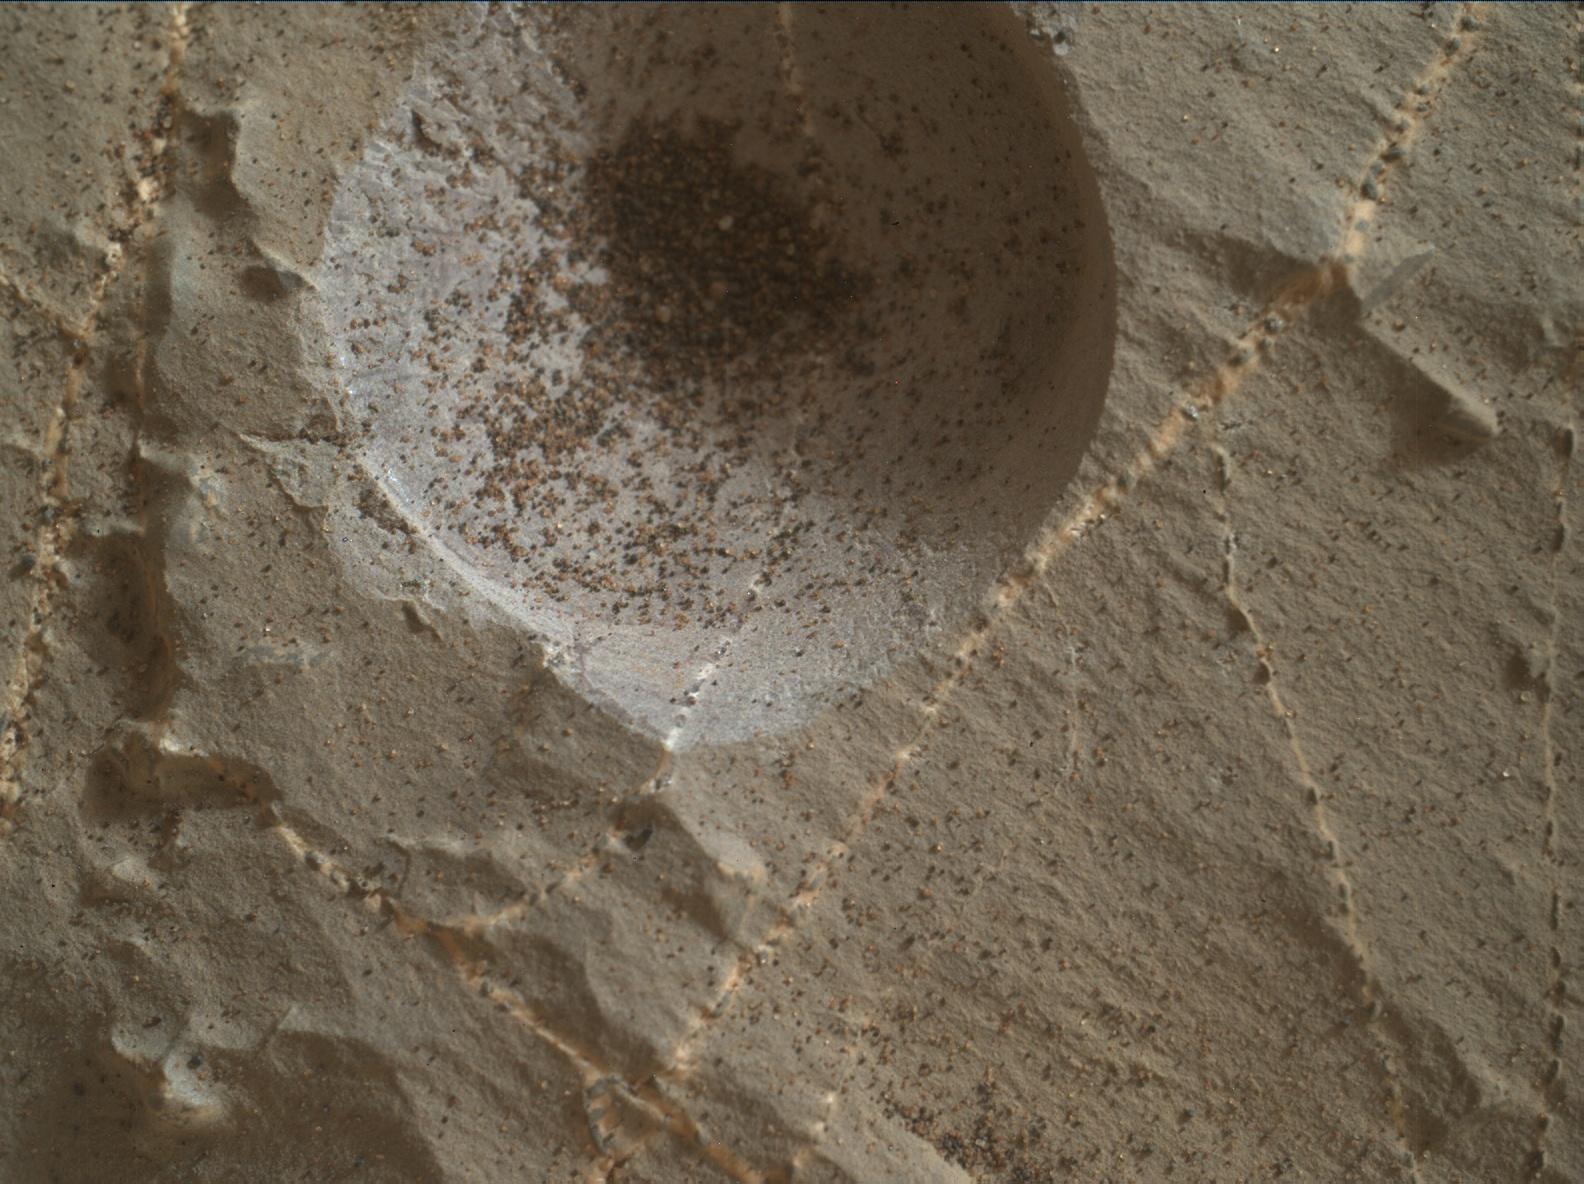 Image taken by Mars Hand Lens Imager